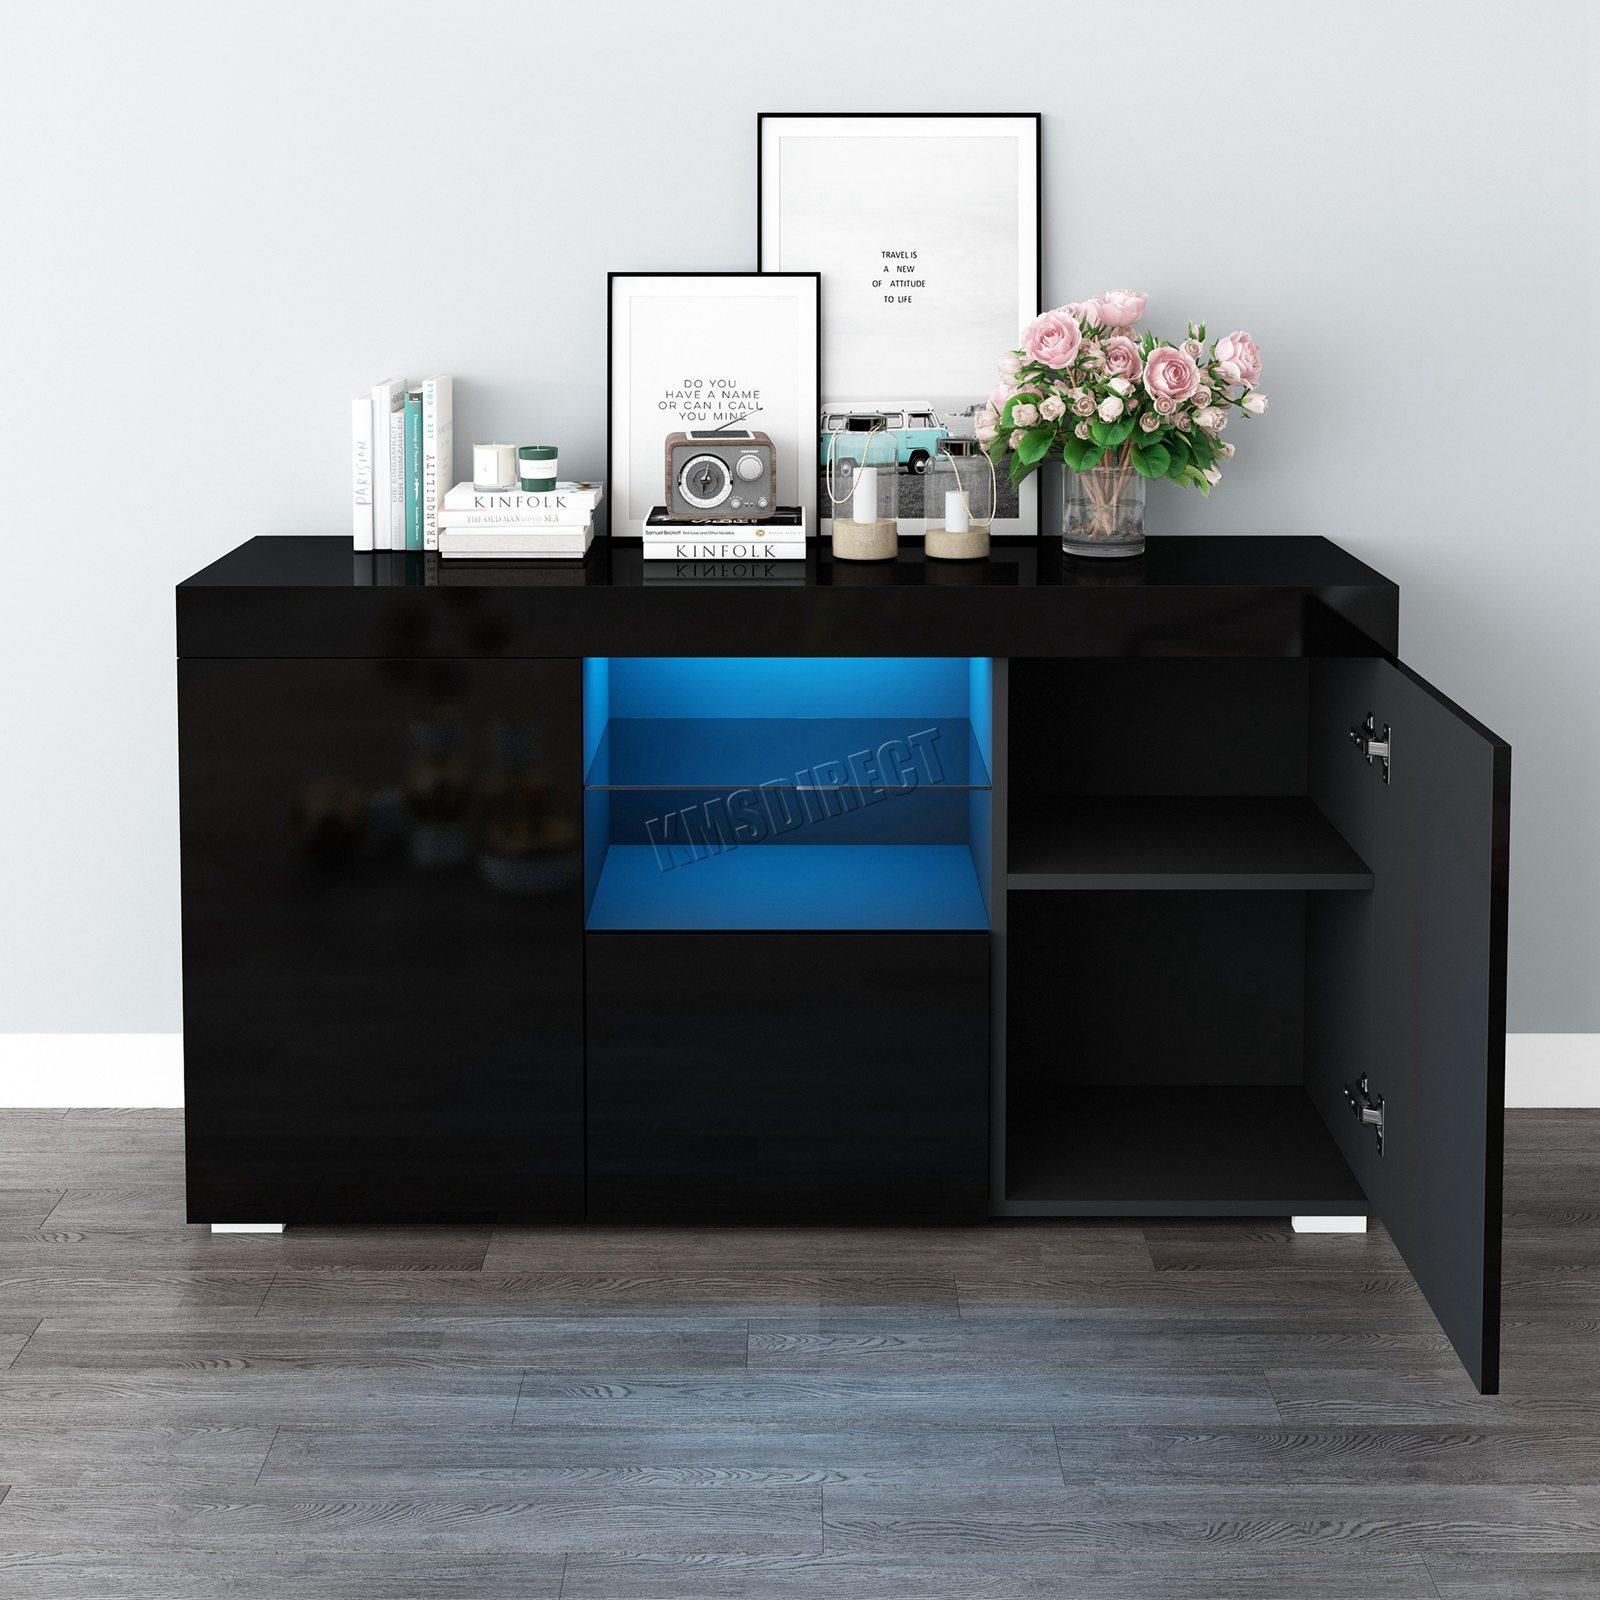 WestWood-PB-High-Gloss-Cabinet-LED-Bookshelf-Sideboard-Cupboard-Home-Unit-PHC03 thumbnail 15